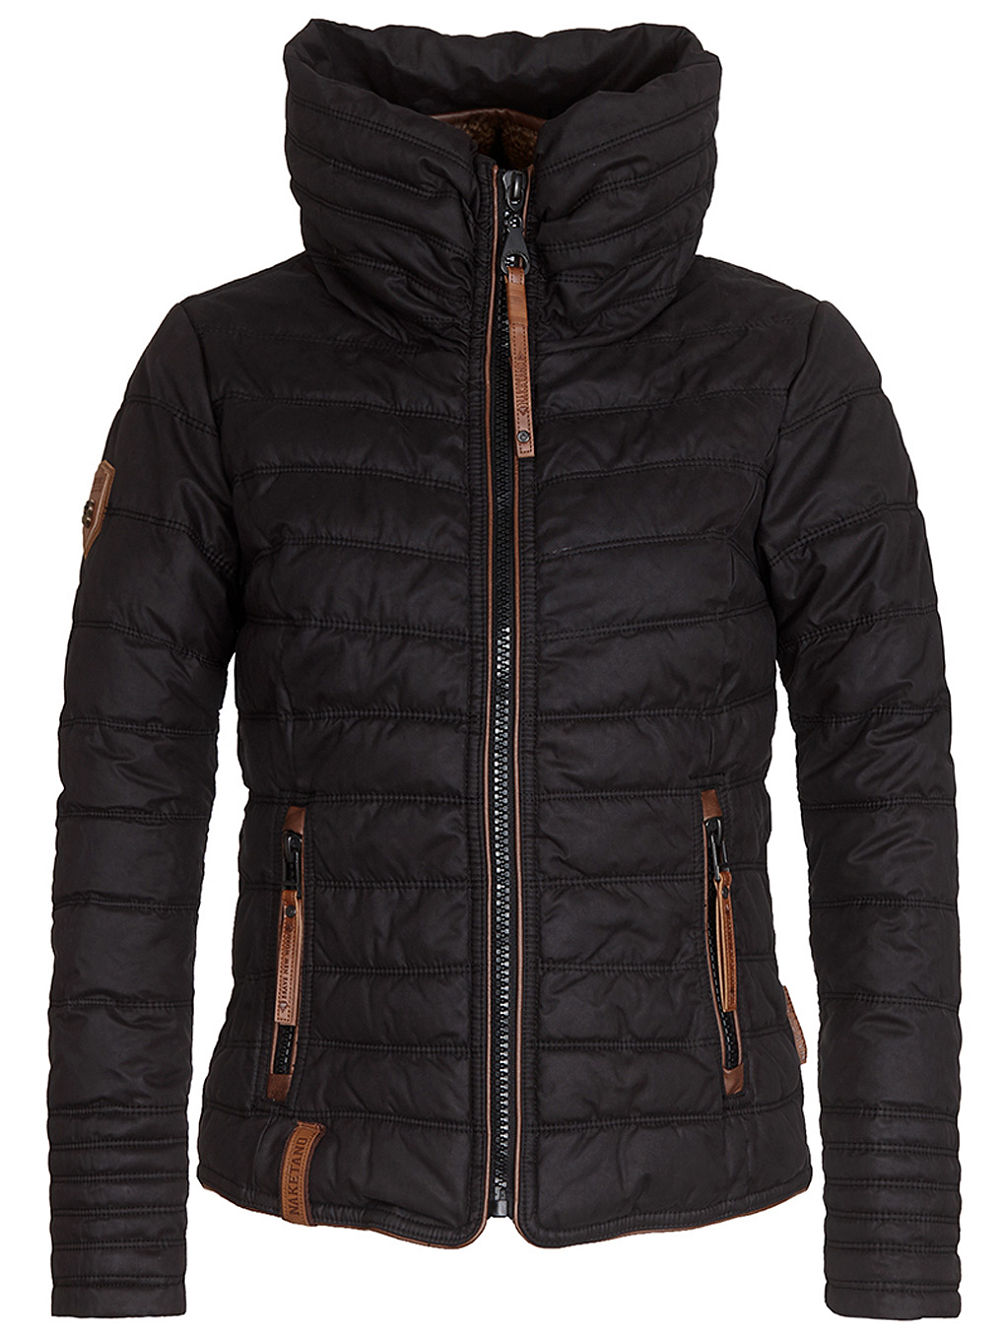 buy naketano feierbiest jacket online at blue. Black Bedroom Furniture Sets. Home Design Ideas